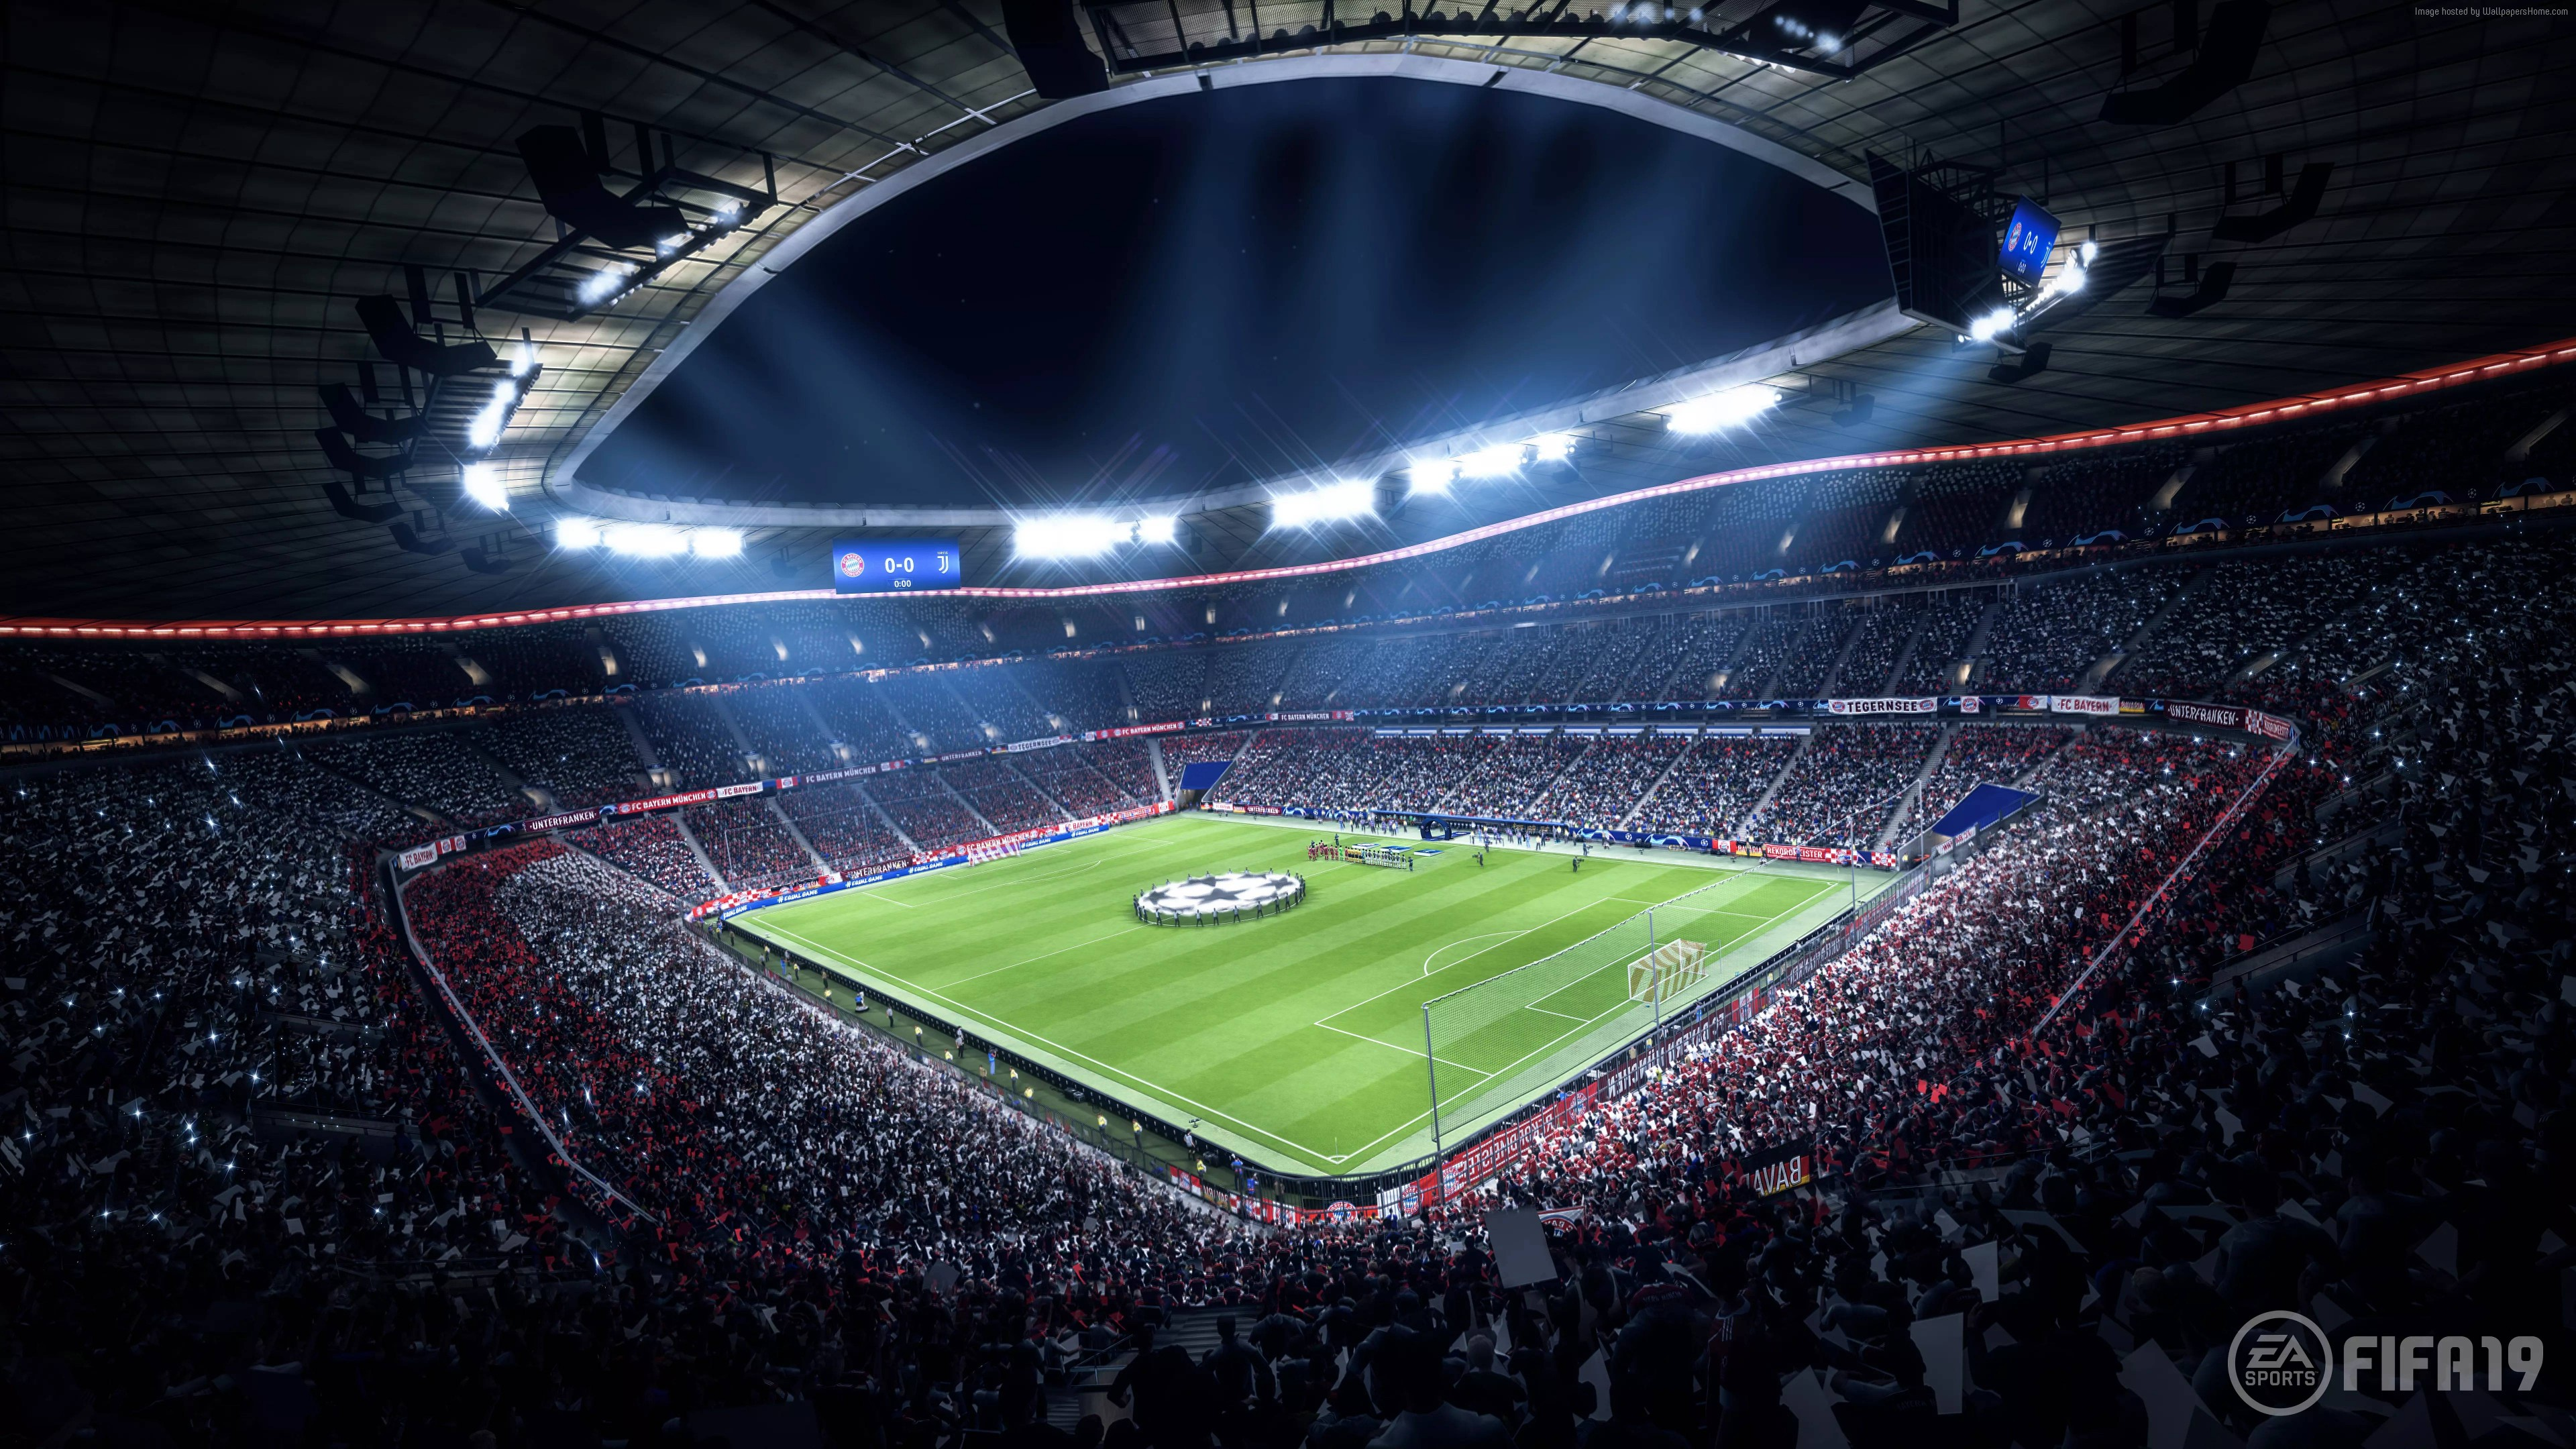 Wallpaper FIFA 19 E3 2018 Screenshot 8K Games 8k Download